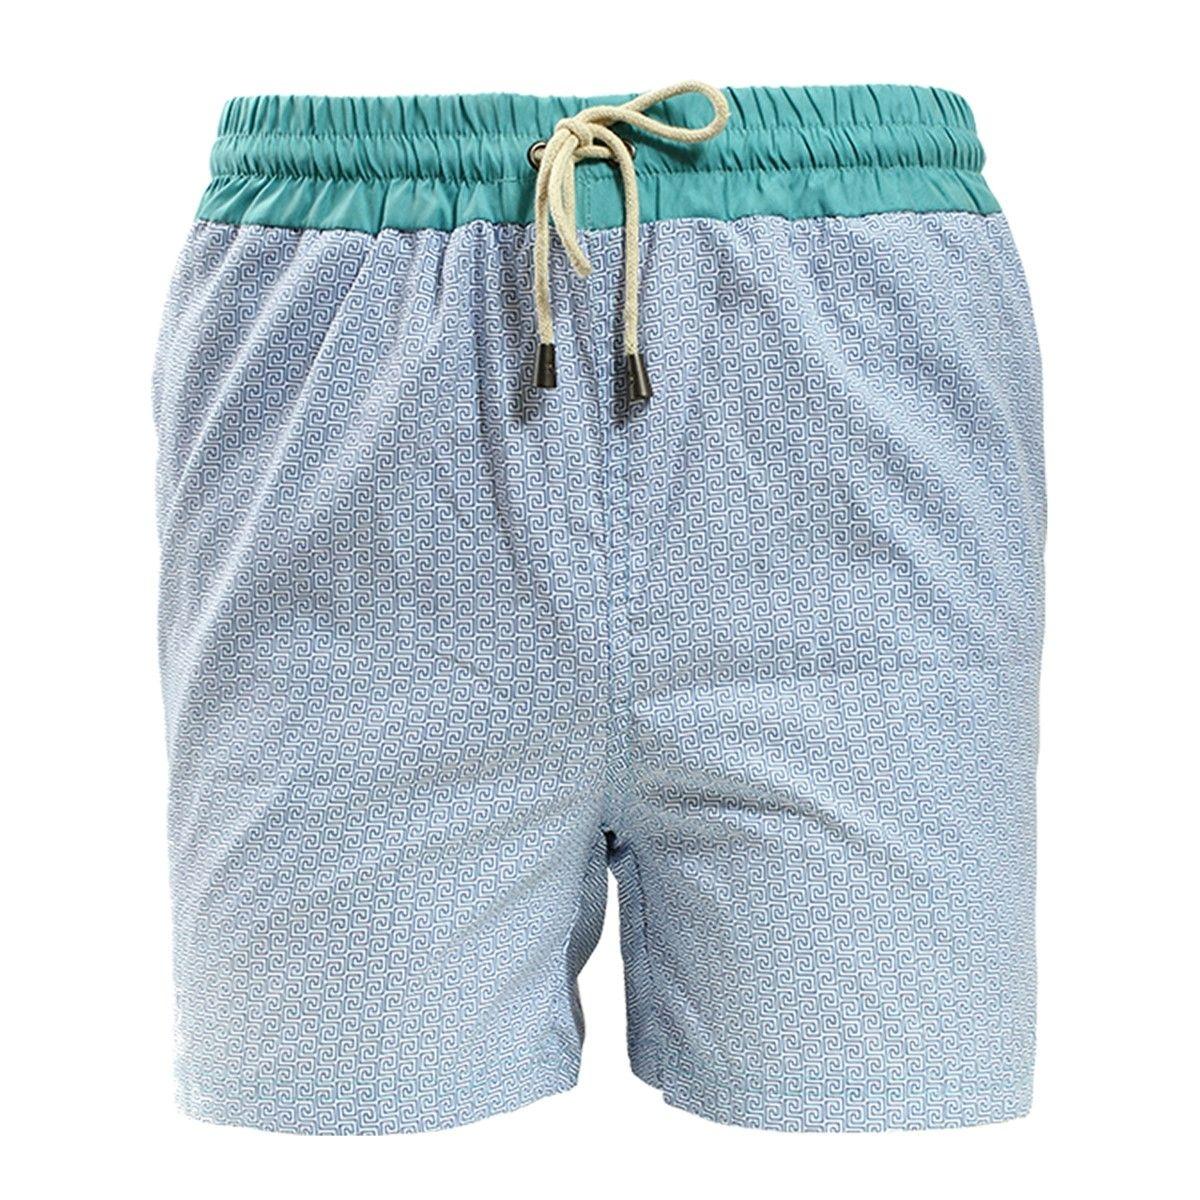 Short de bain motifs romains bleu avec ceinture bleue